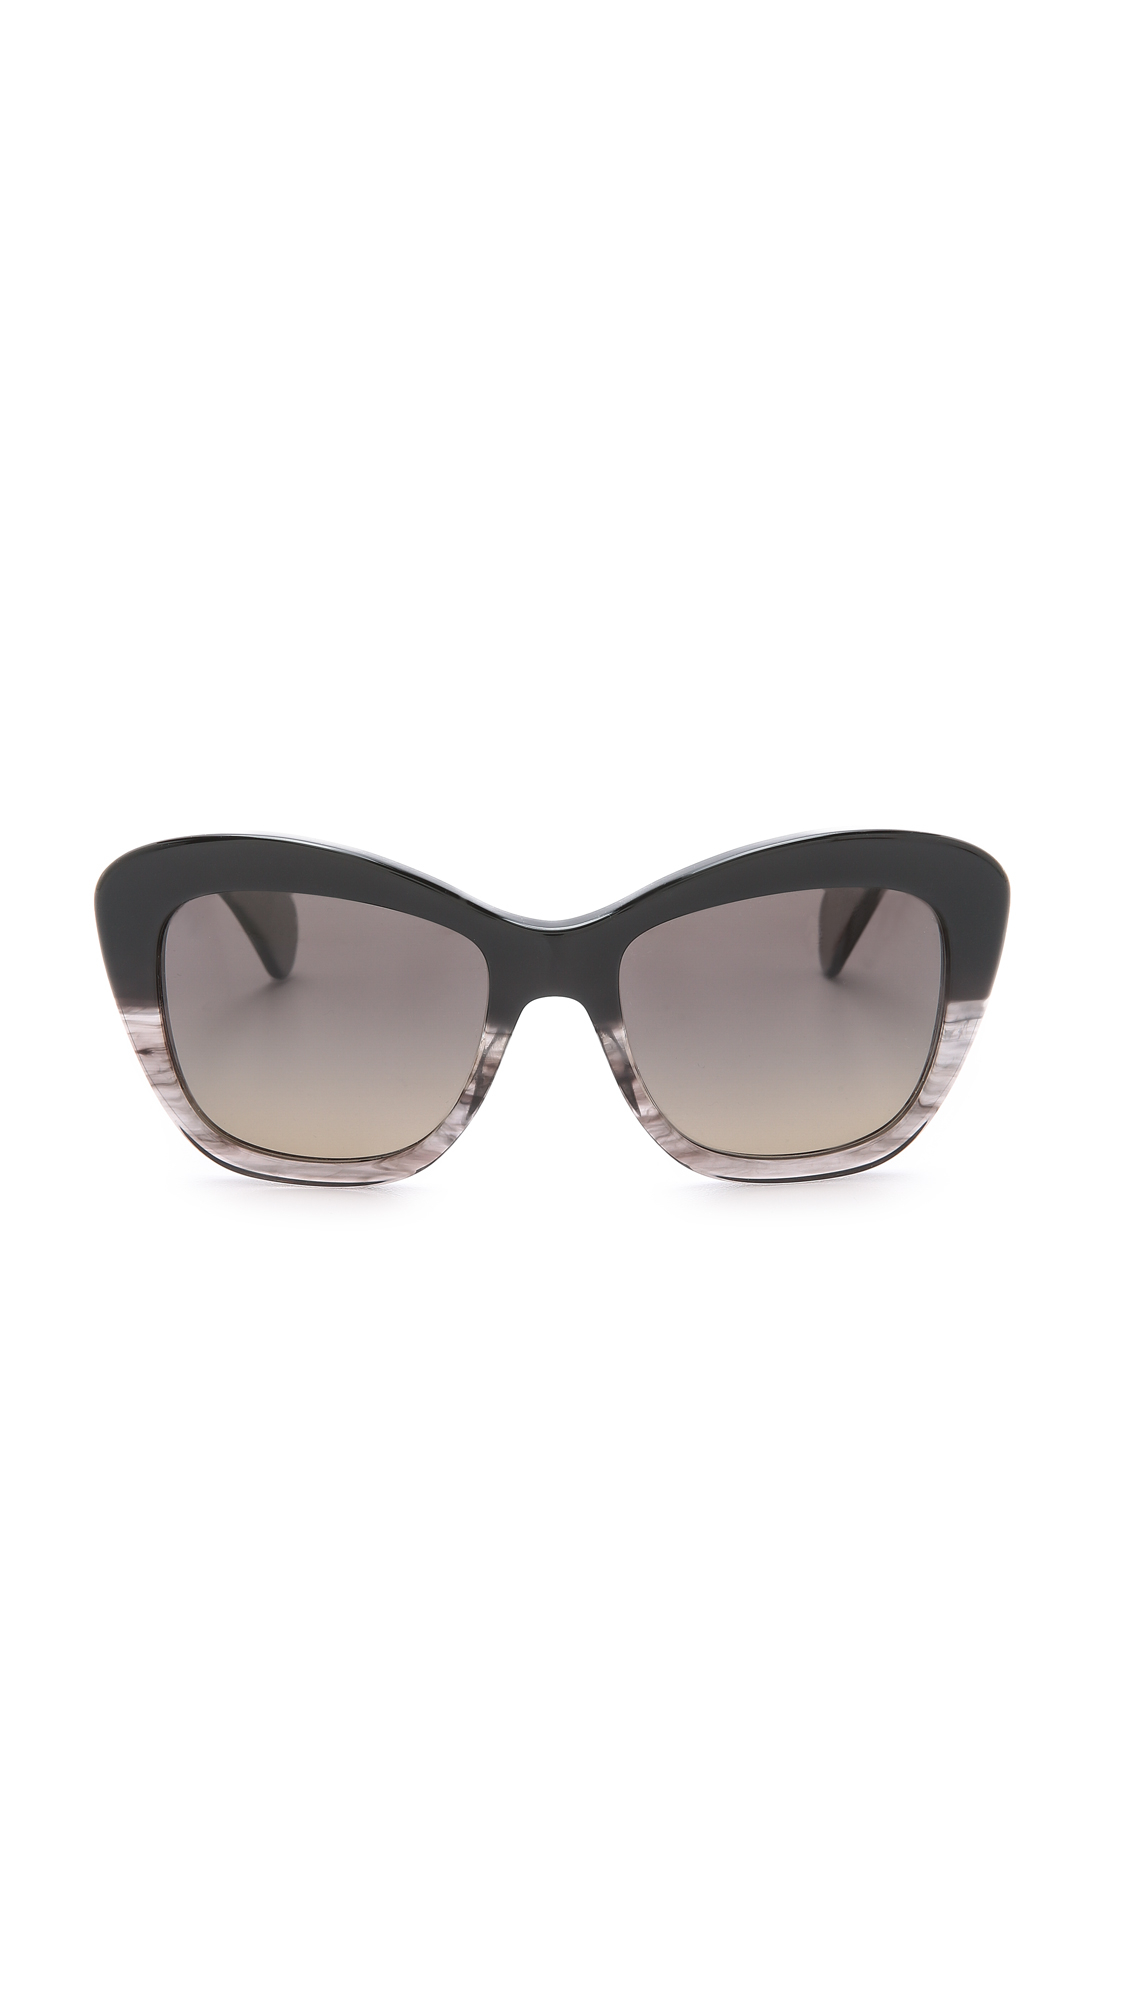 polar sunglasses bhun  polar sunglasses